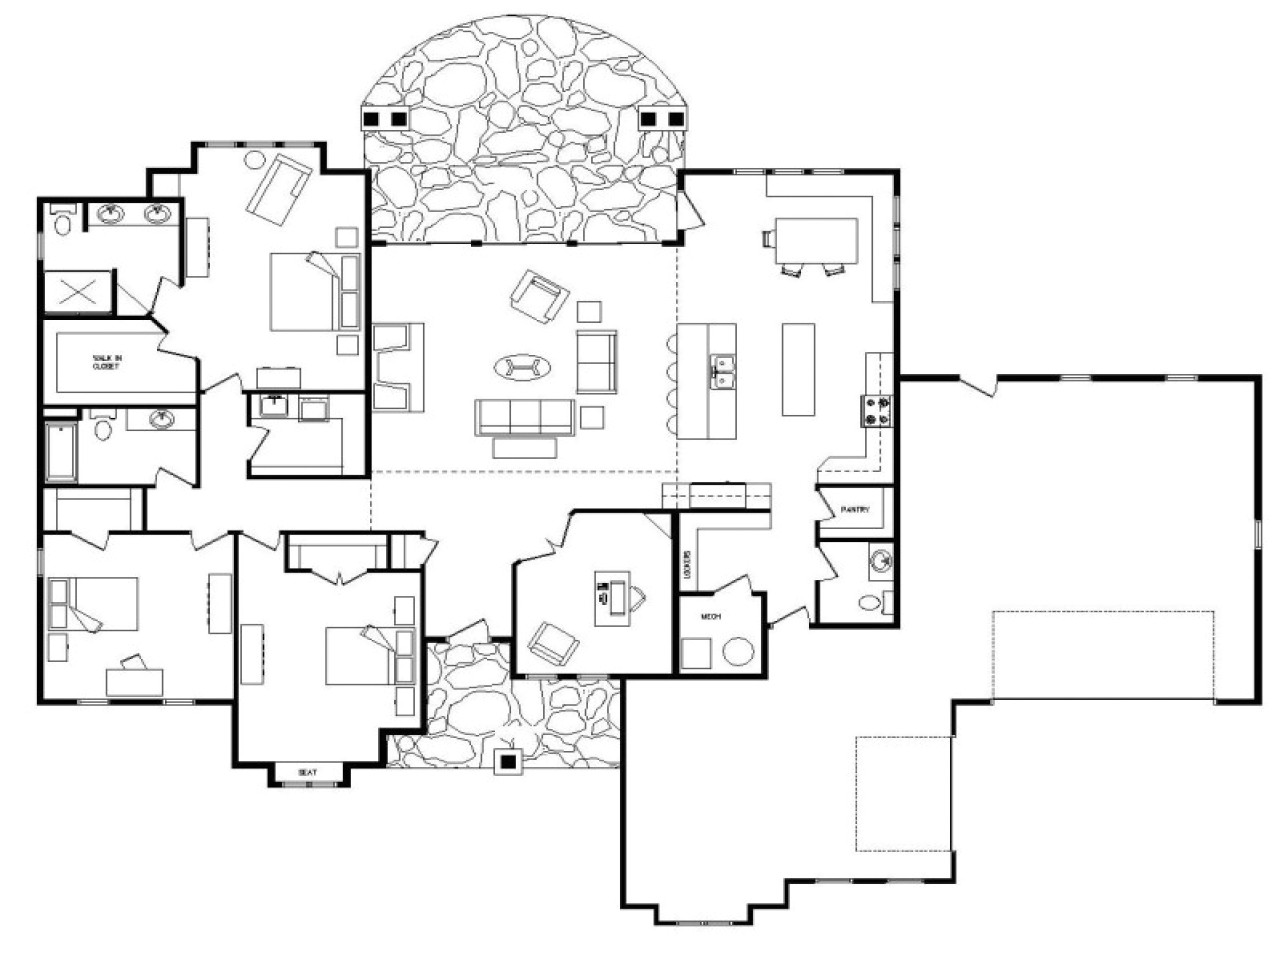 71a9da55e20f1309 open floor plans one level homes modern open floor plans